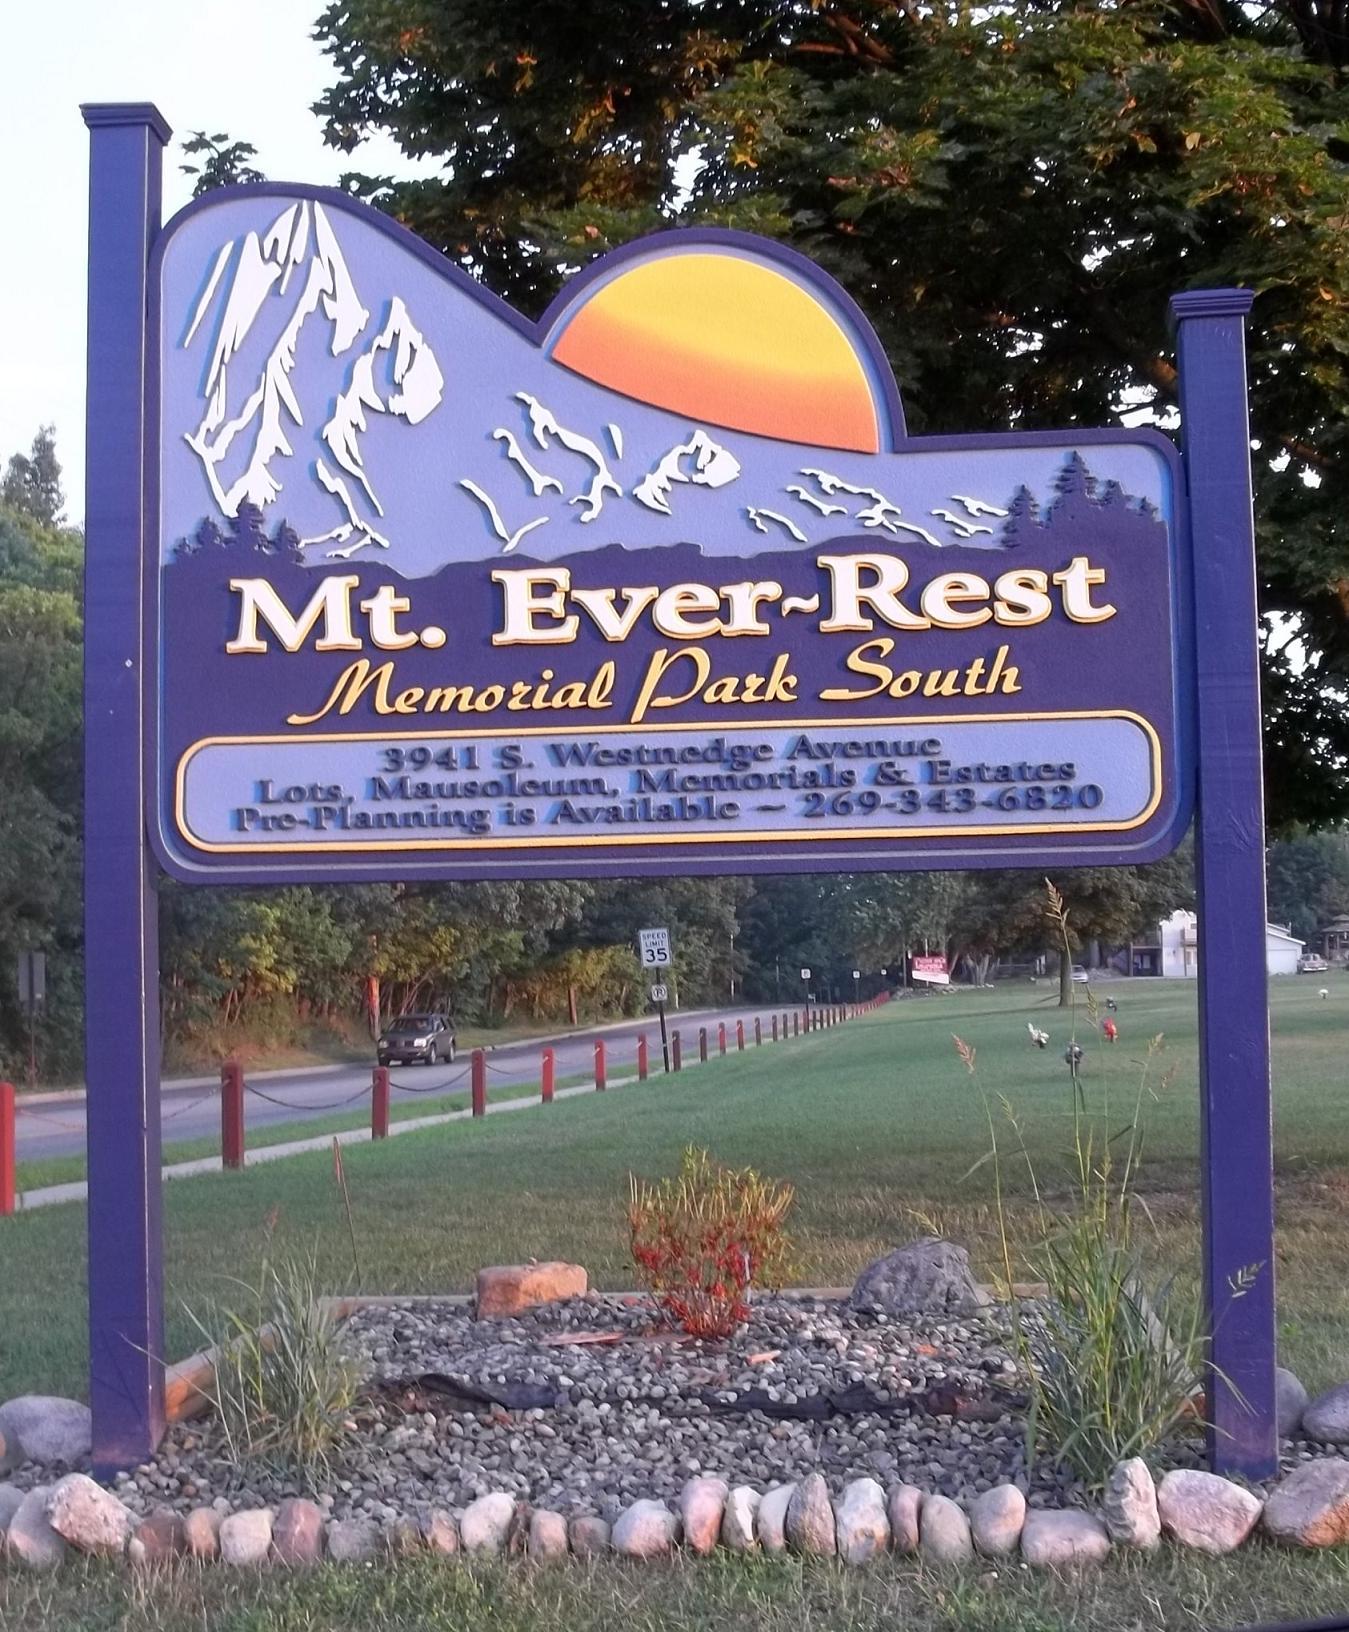 Mount Ever-Rest Memorial Park South